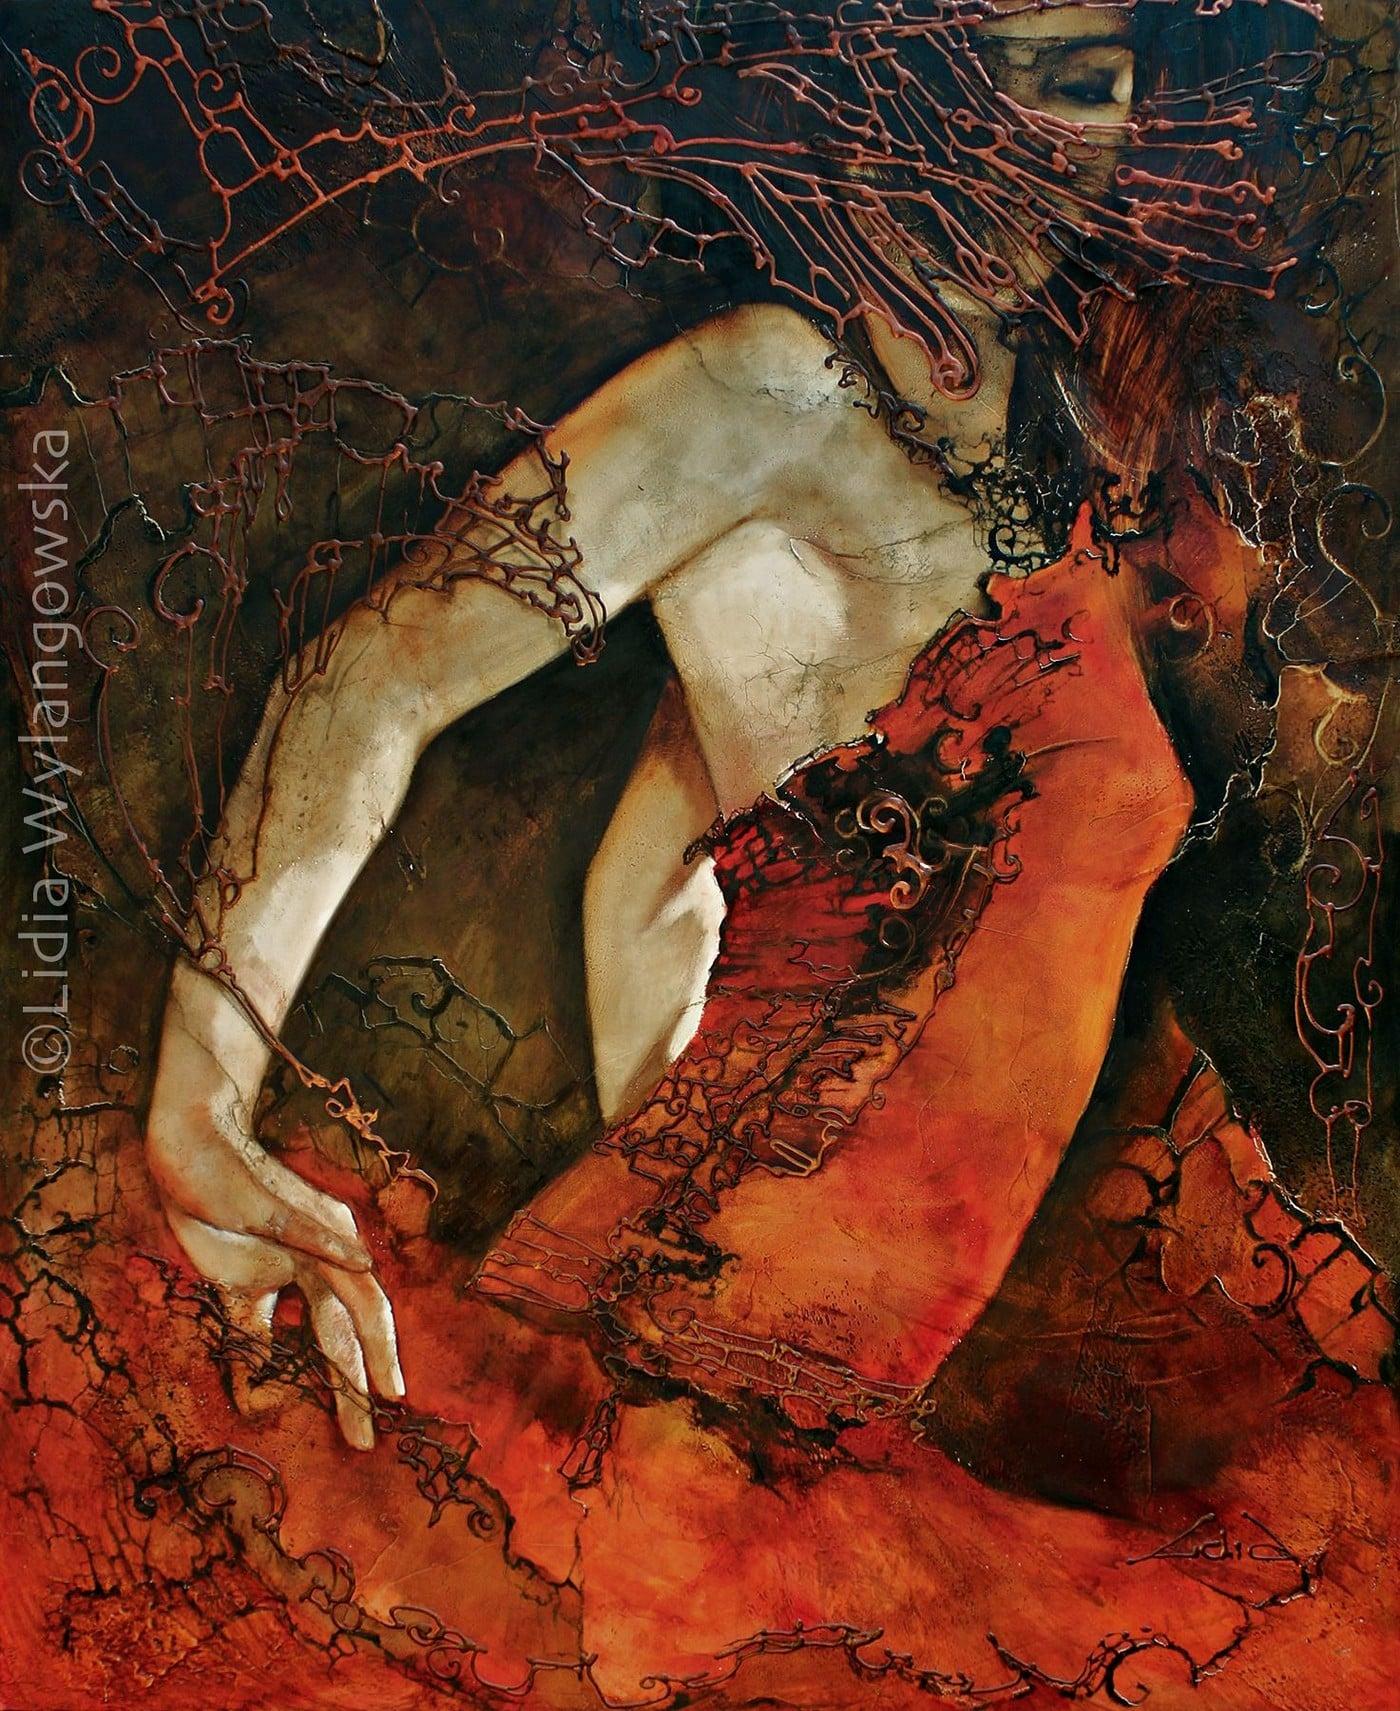 Wylangowska-Dance-of-the-Seven-Veils